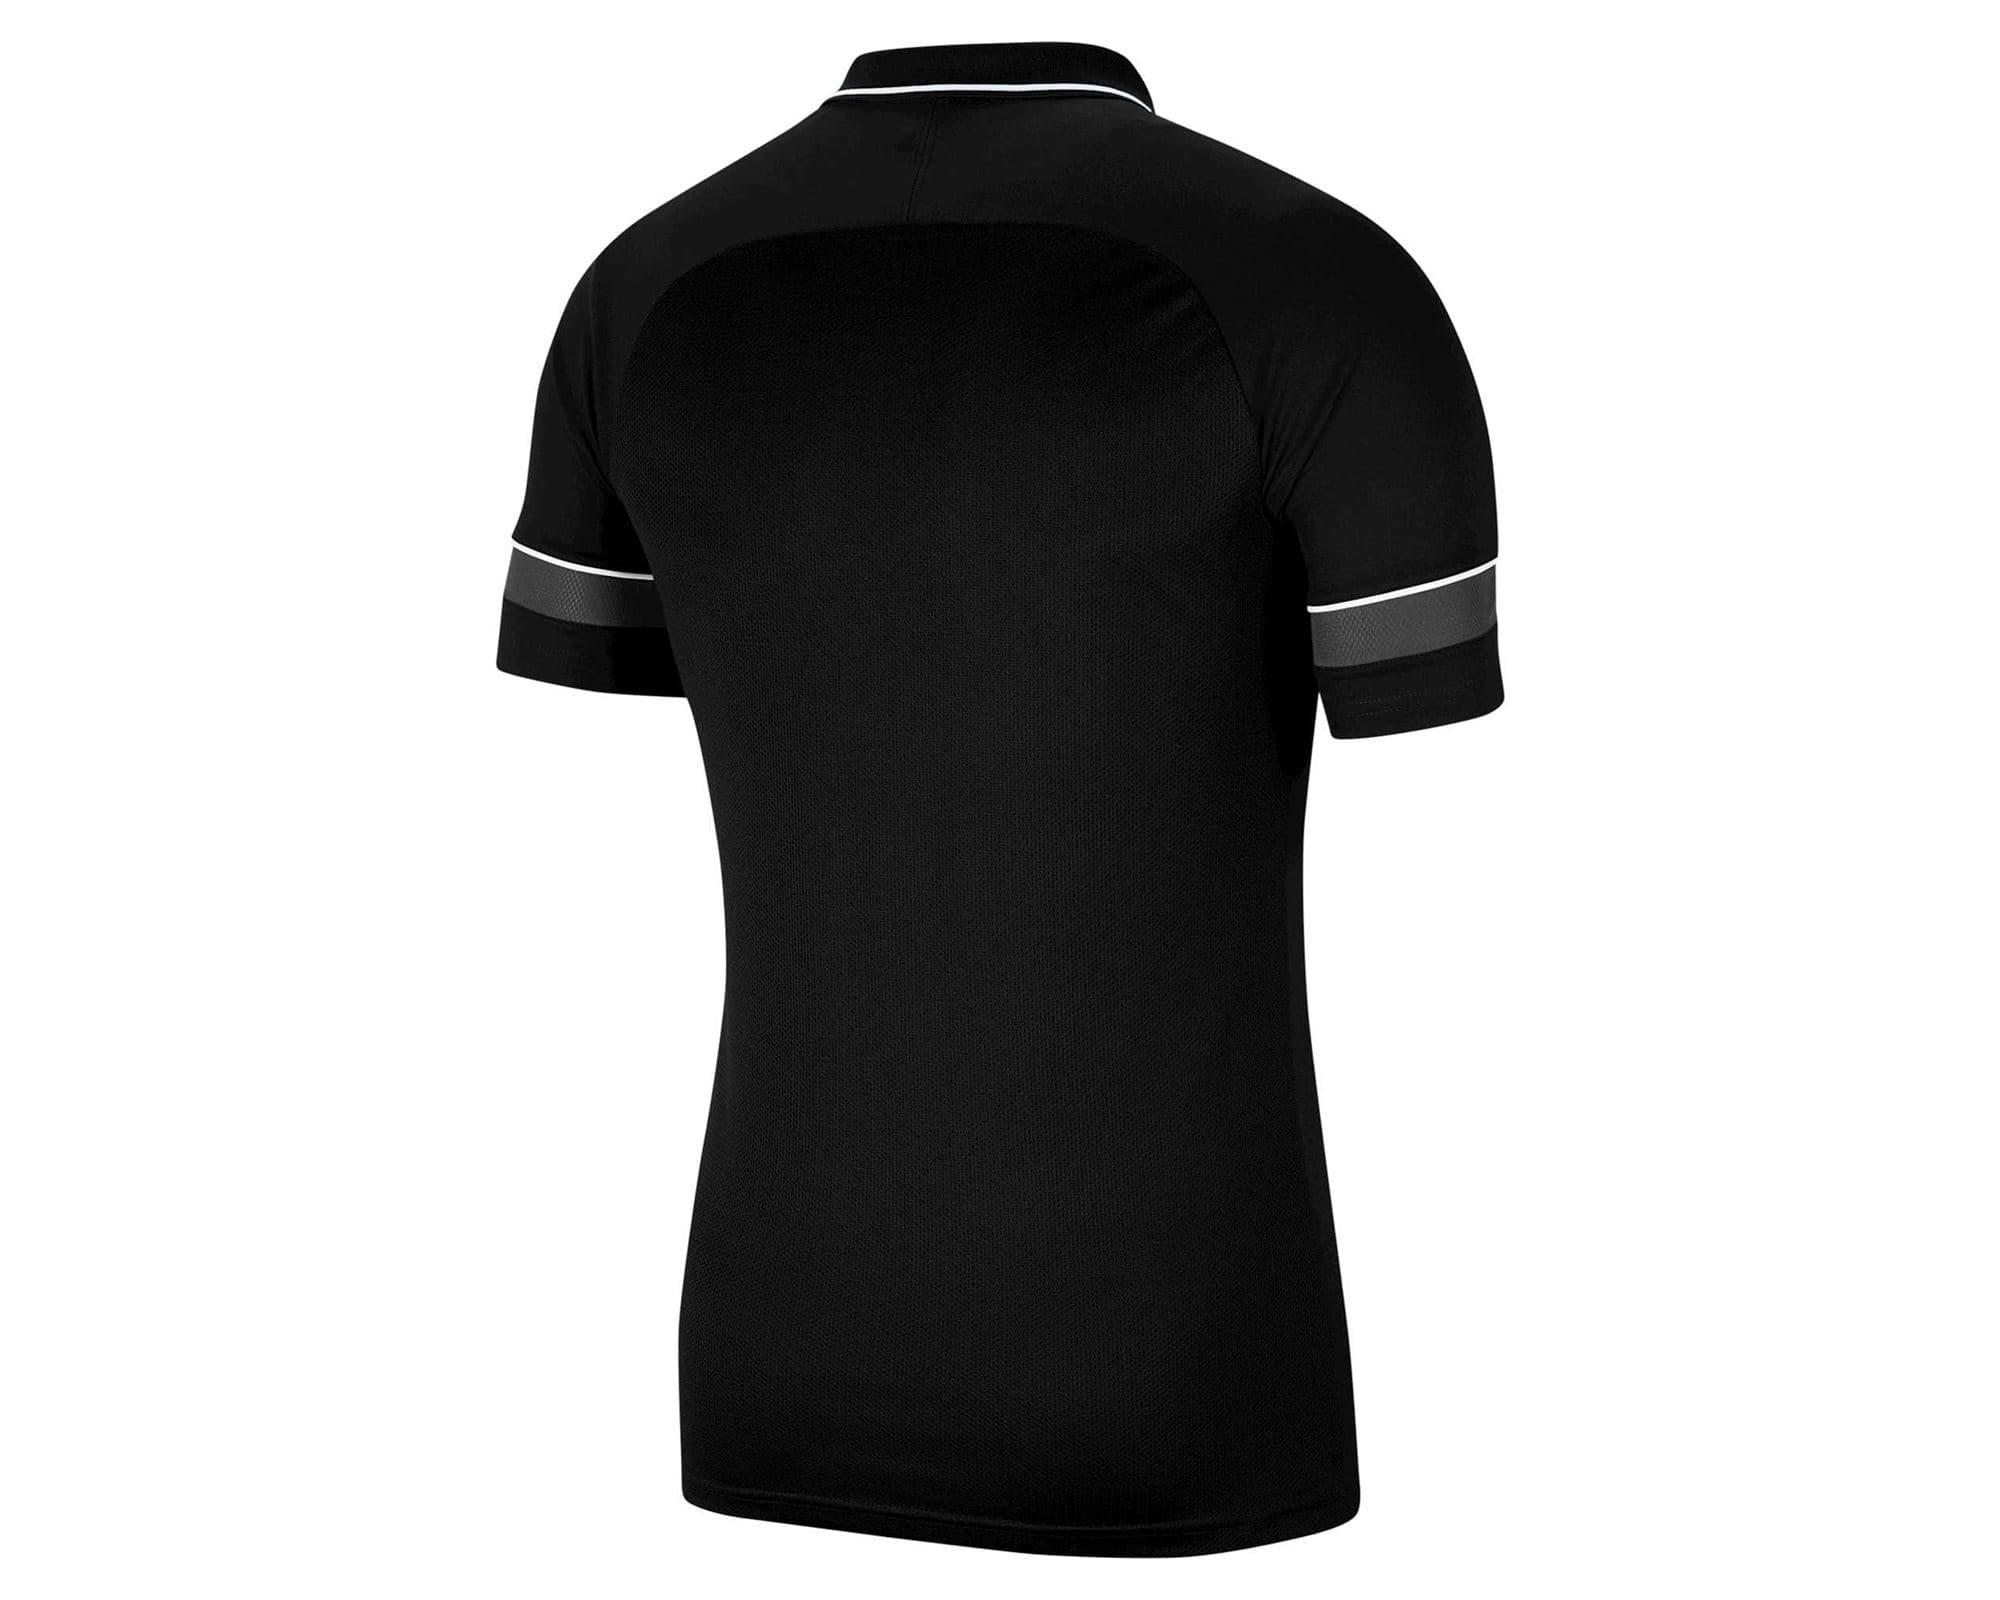 Academy 21 Erkek Siyah Polo Tişört (CW6104-014)